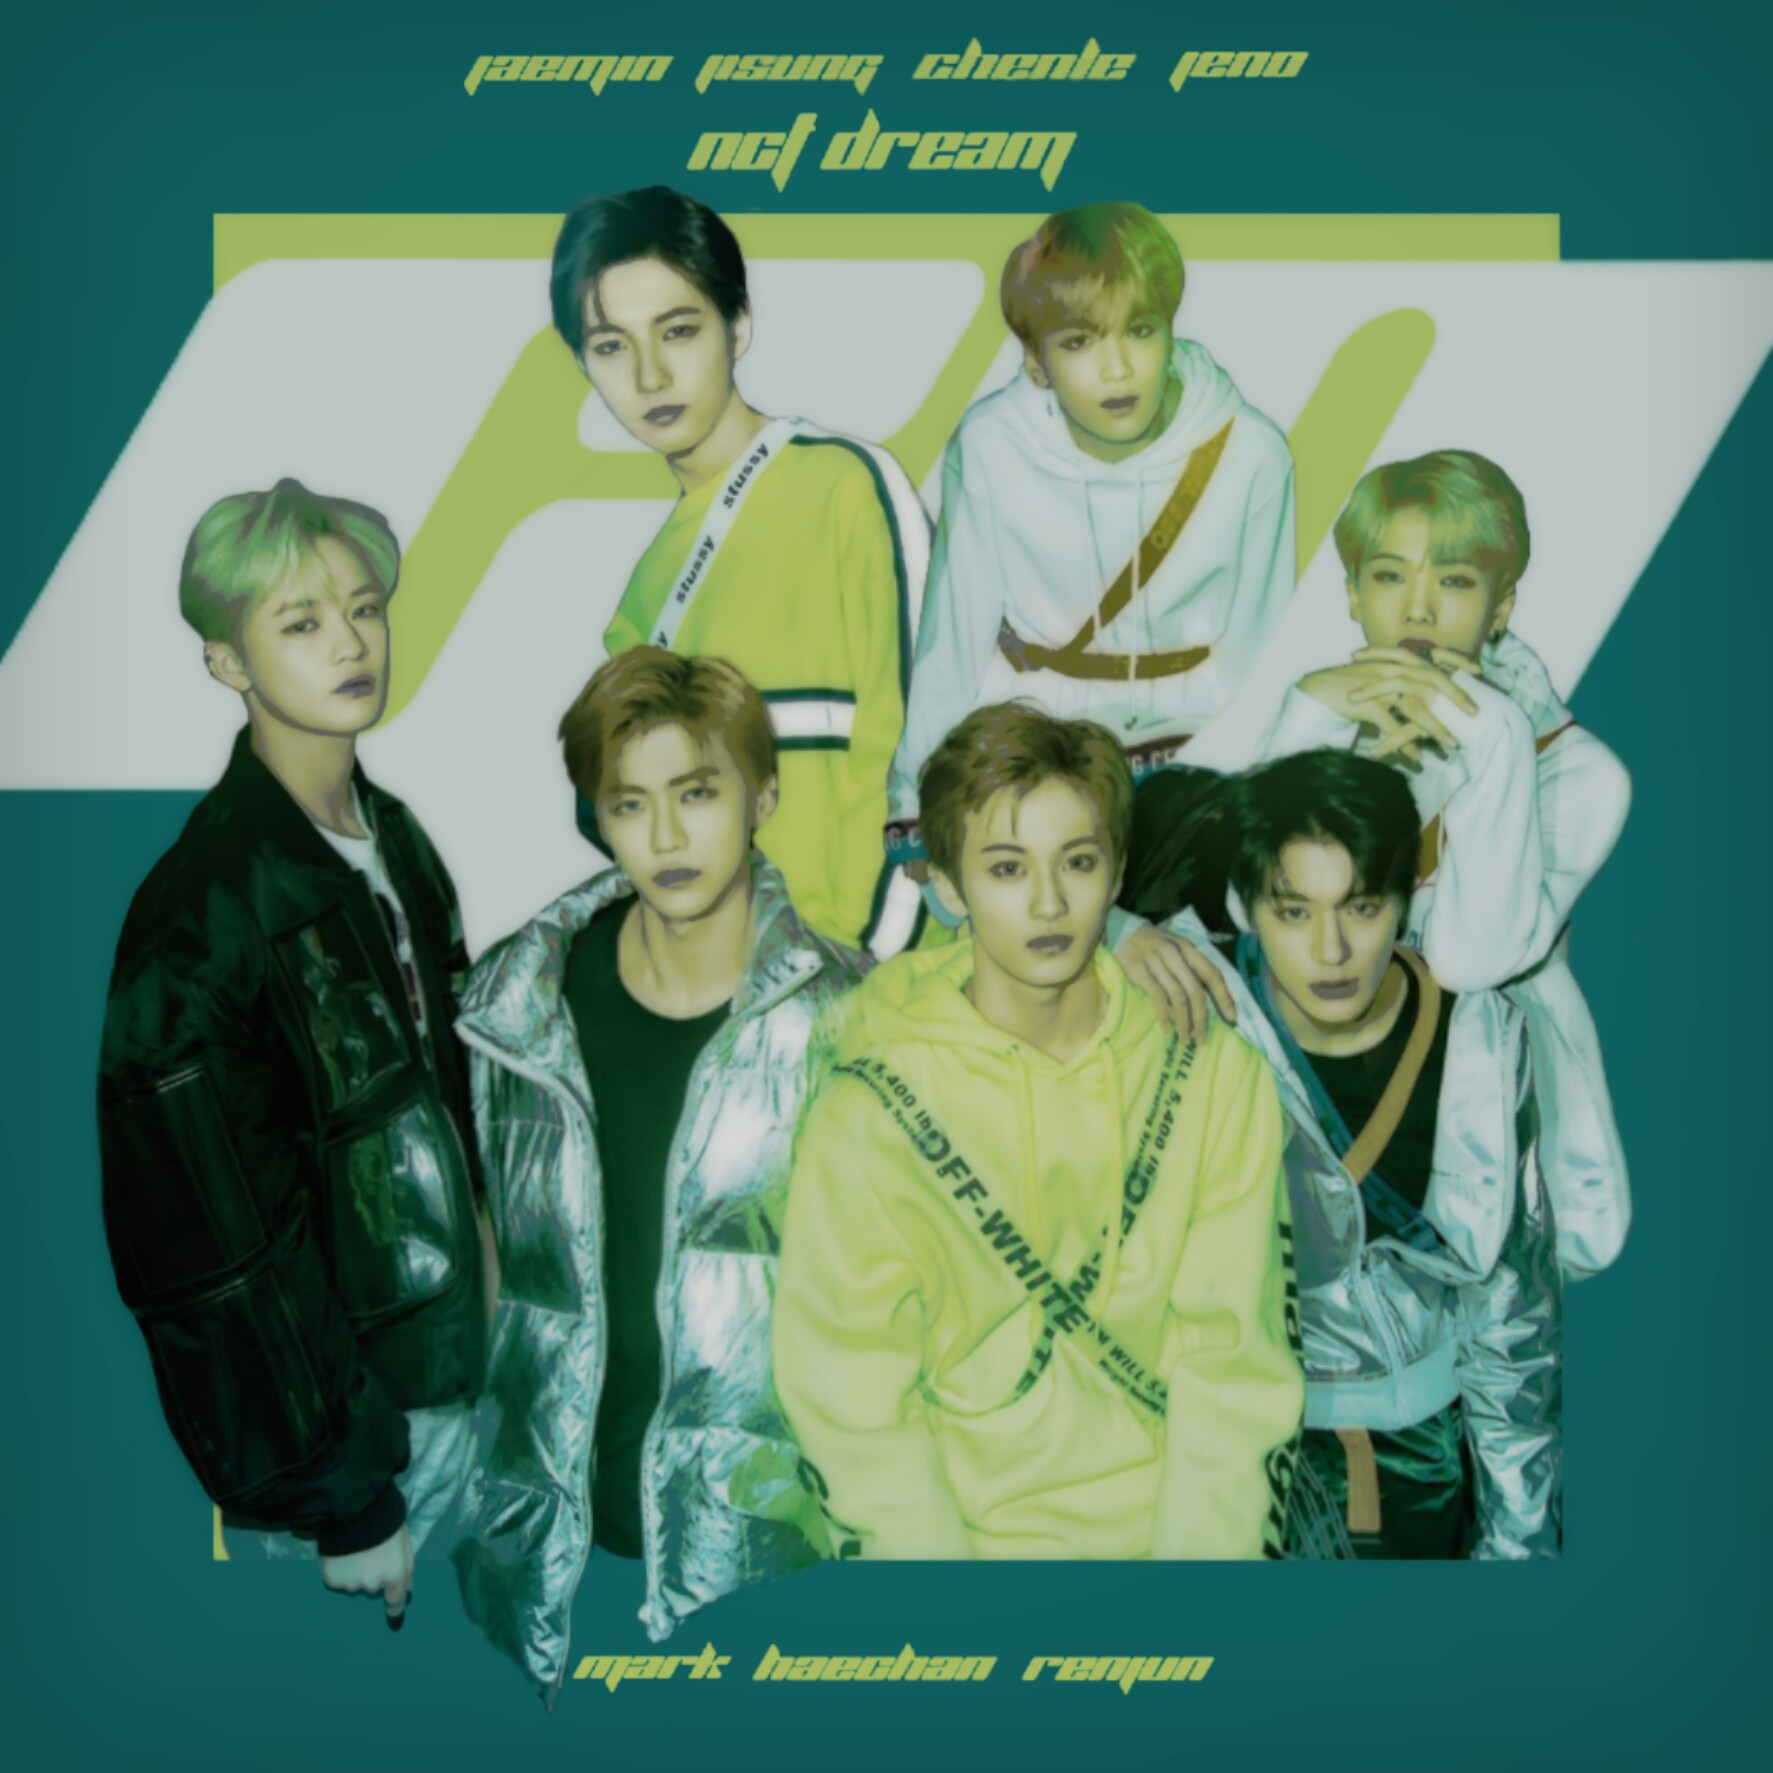 NCT DREAM GO / NCT 2018 EMPATHY album cover by LEAlbum on